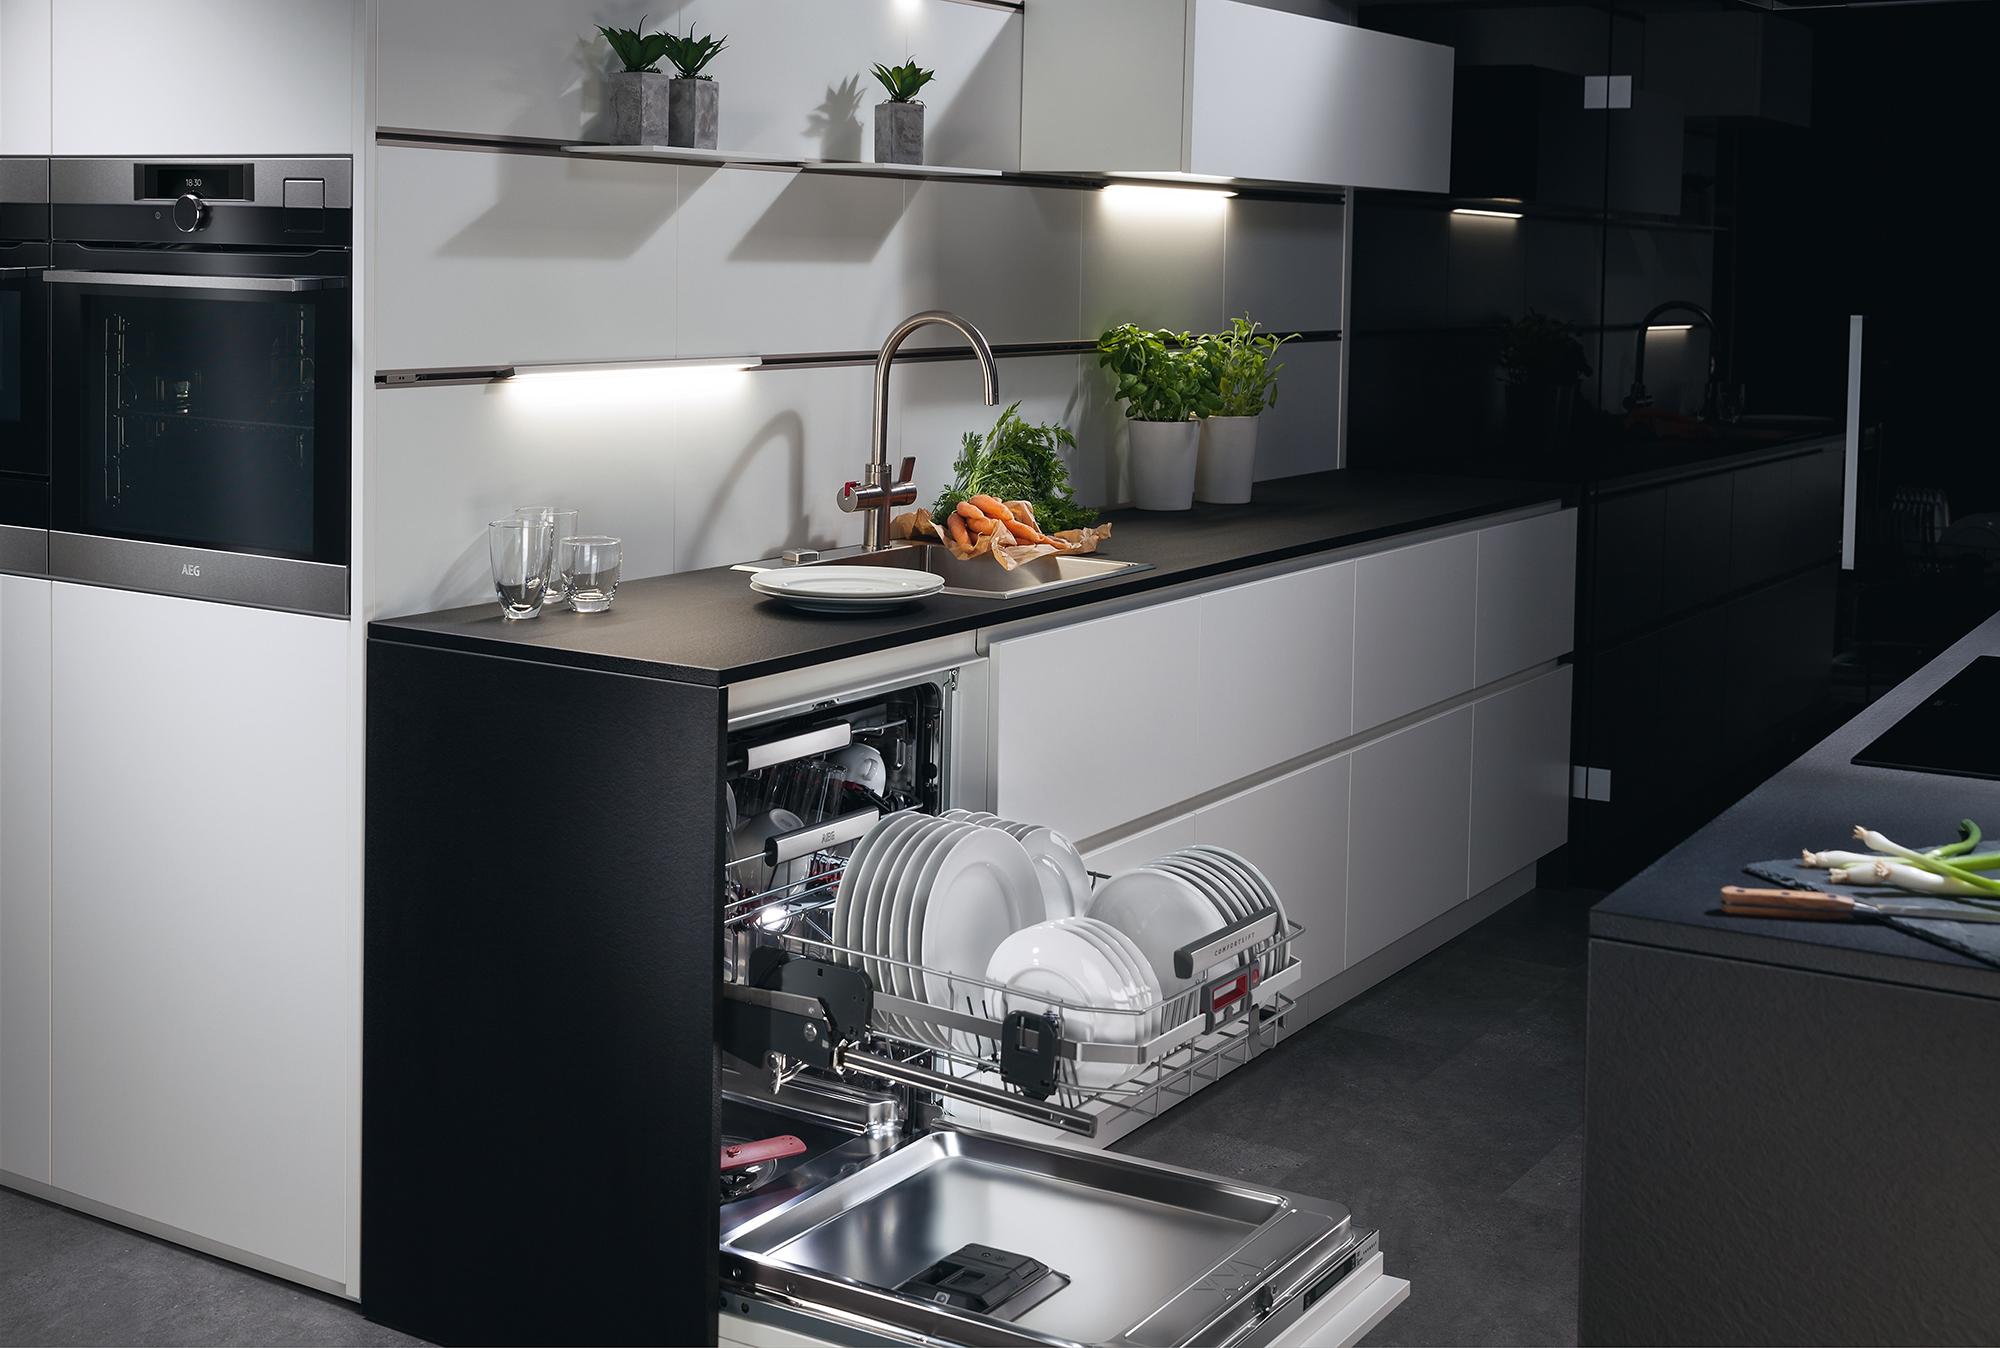 Electrolux Presented The New Aeg Range Home Appliances World